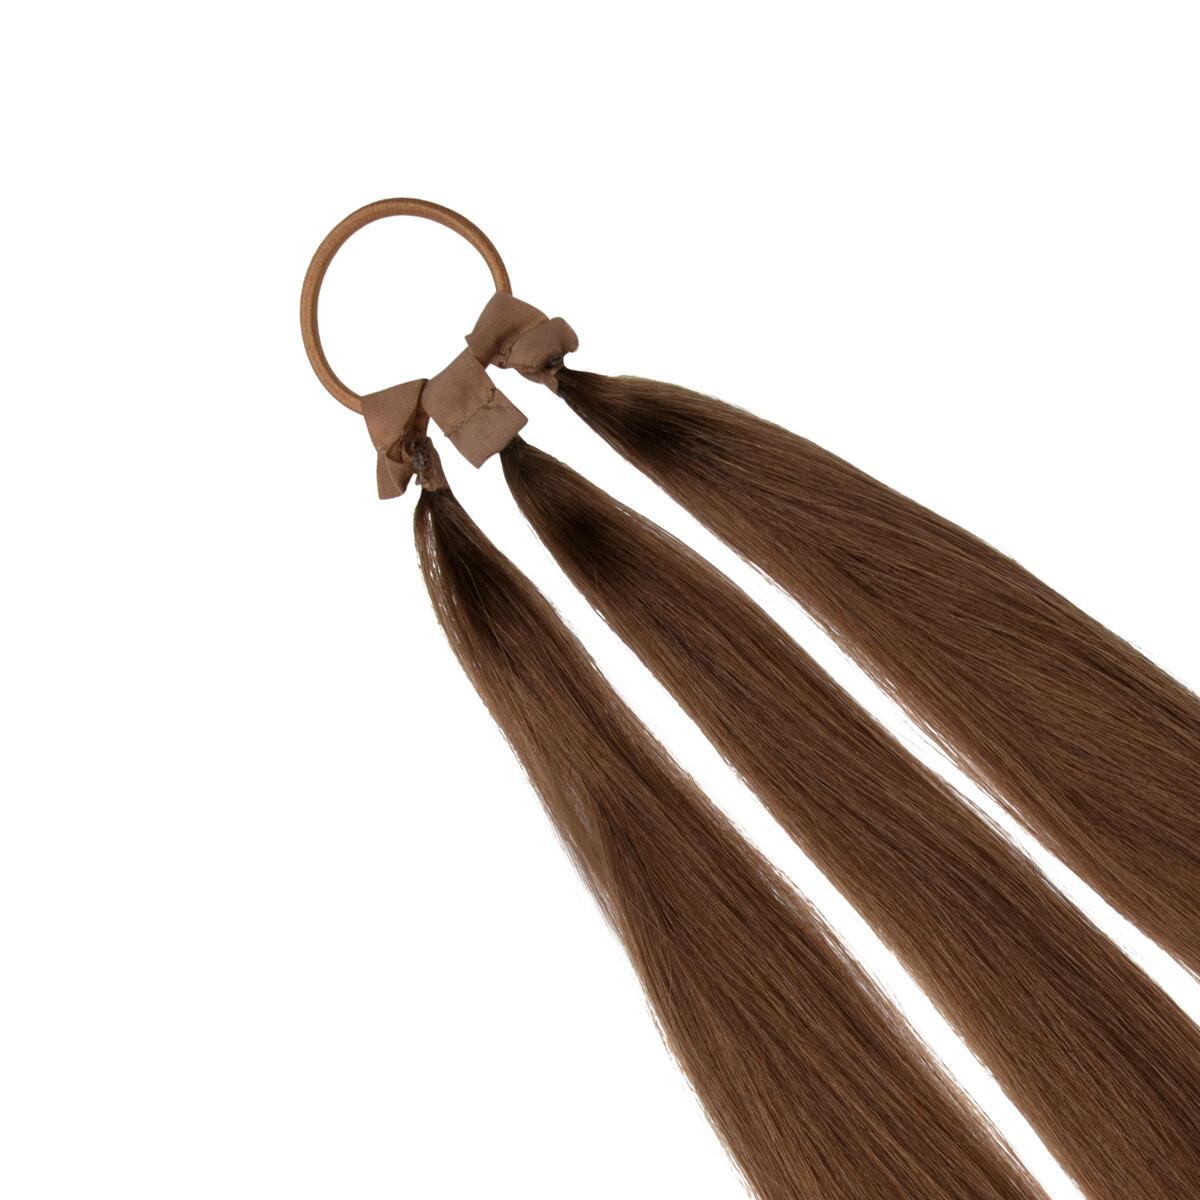 Easy Braid For voluminous braids 5.0 Brown 55 cm